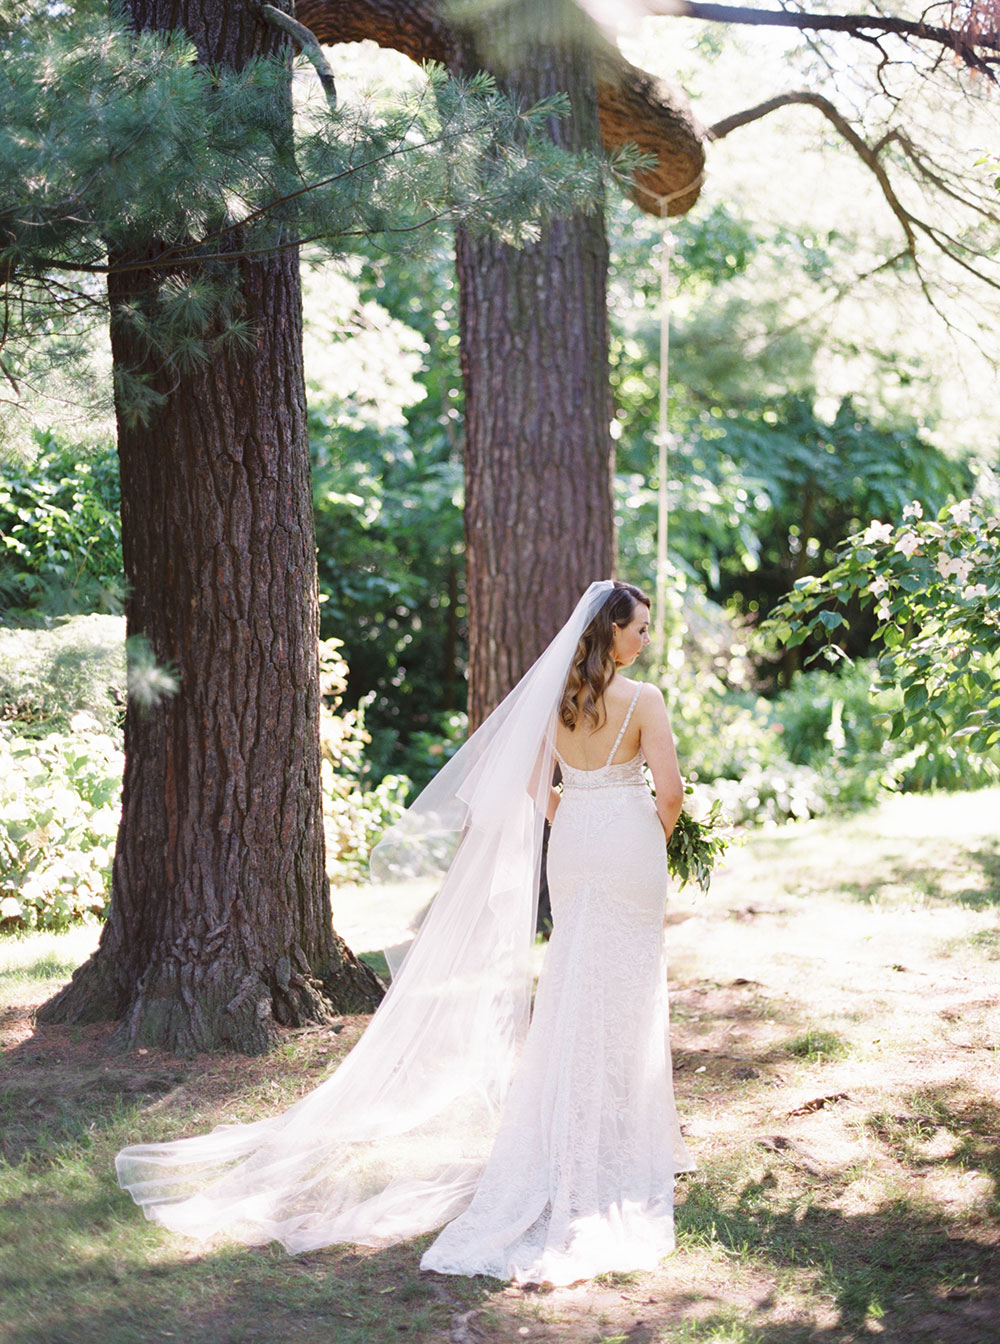 kurtz-orchards-wedding-gracewood-estate-niagara-on-the-lake-photo-by-katie-nicolle-photography-0046.JPG